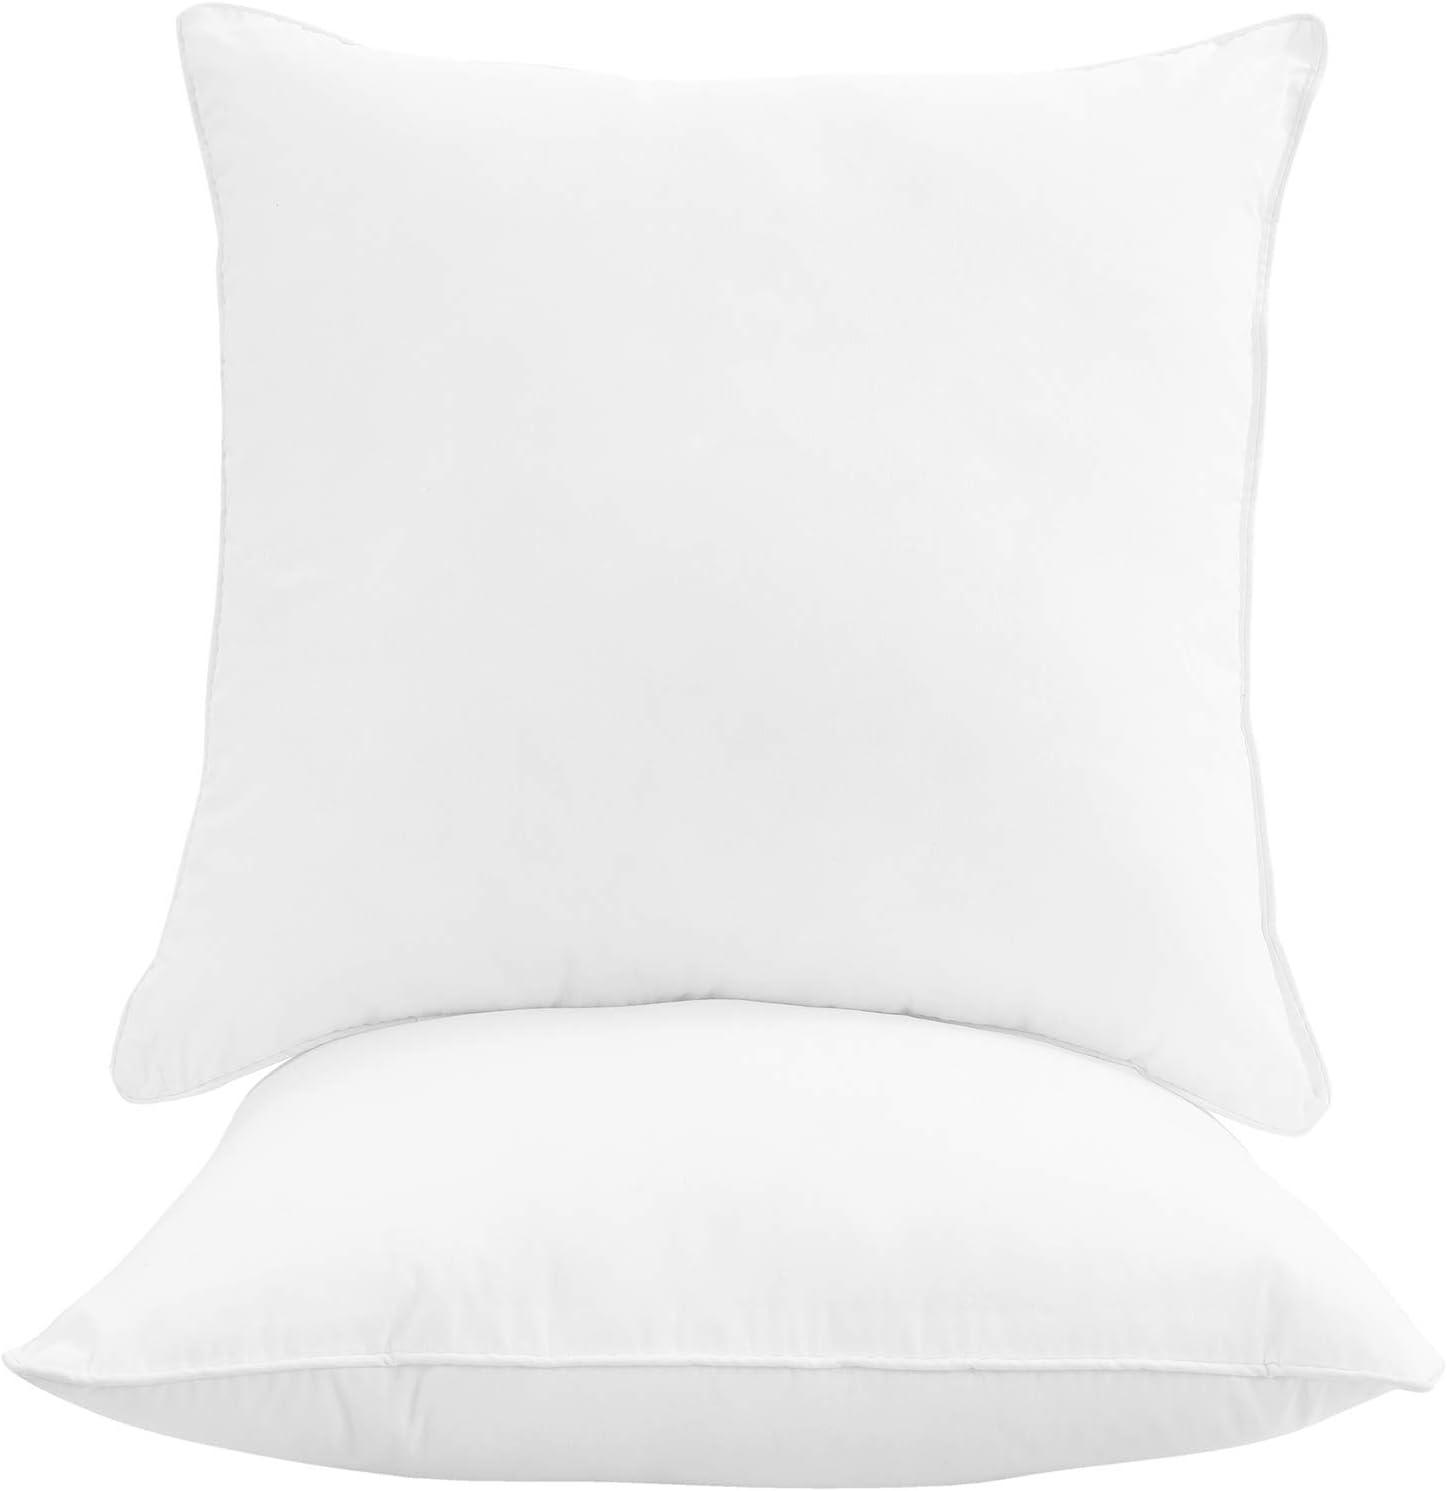 Oakias In stock Set of Branded goods 2 Throw Pillow – White 12 Cotton x Inserts